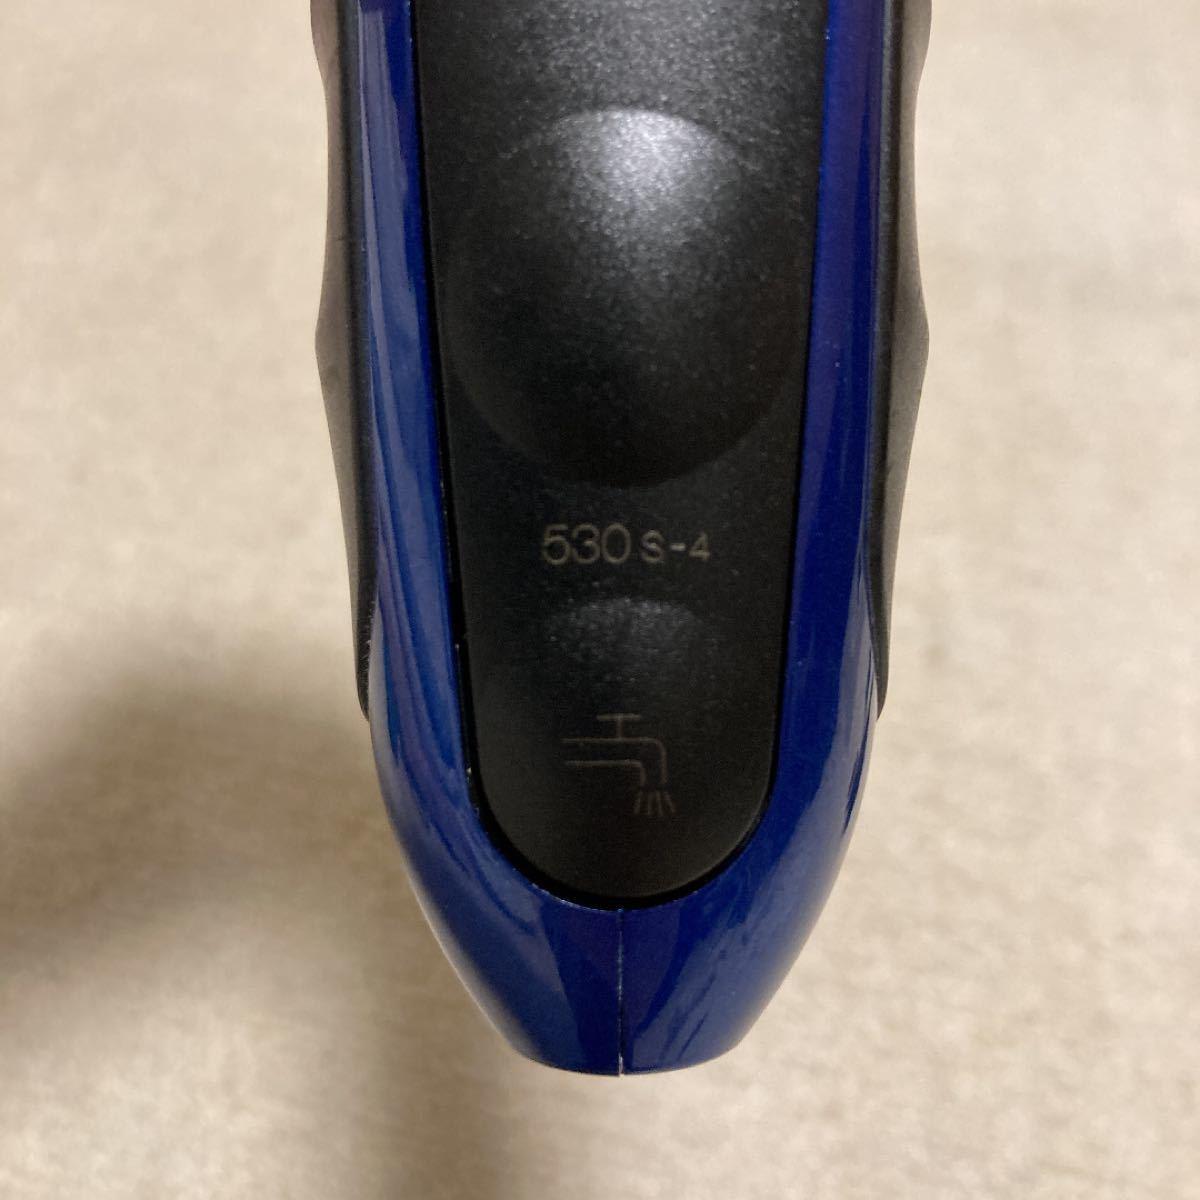 BRAUN ブラウン シェーバー Series5 530S-4 水洗い可能